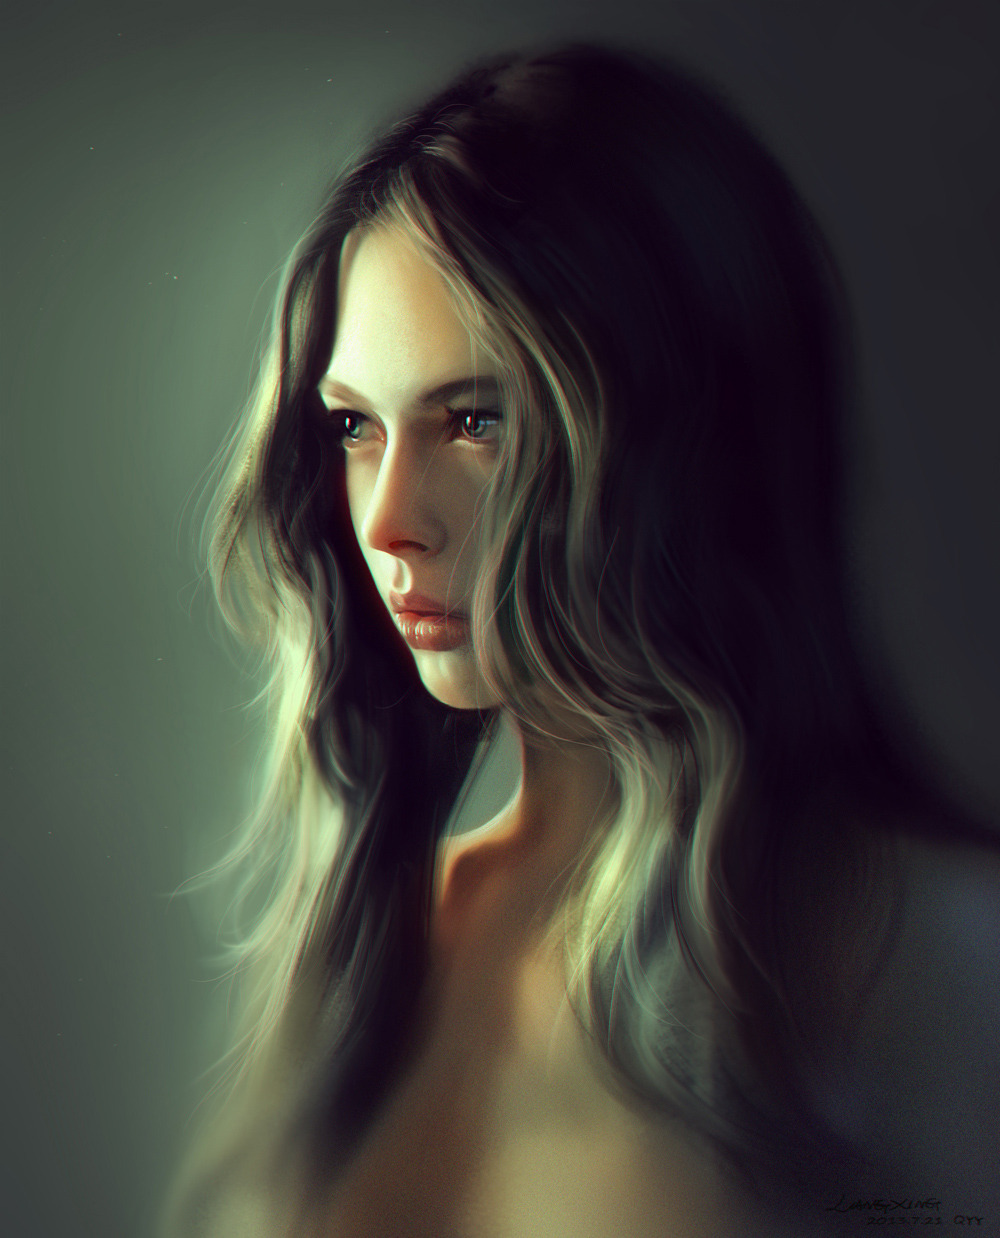 Girl portrait by liang xing